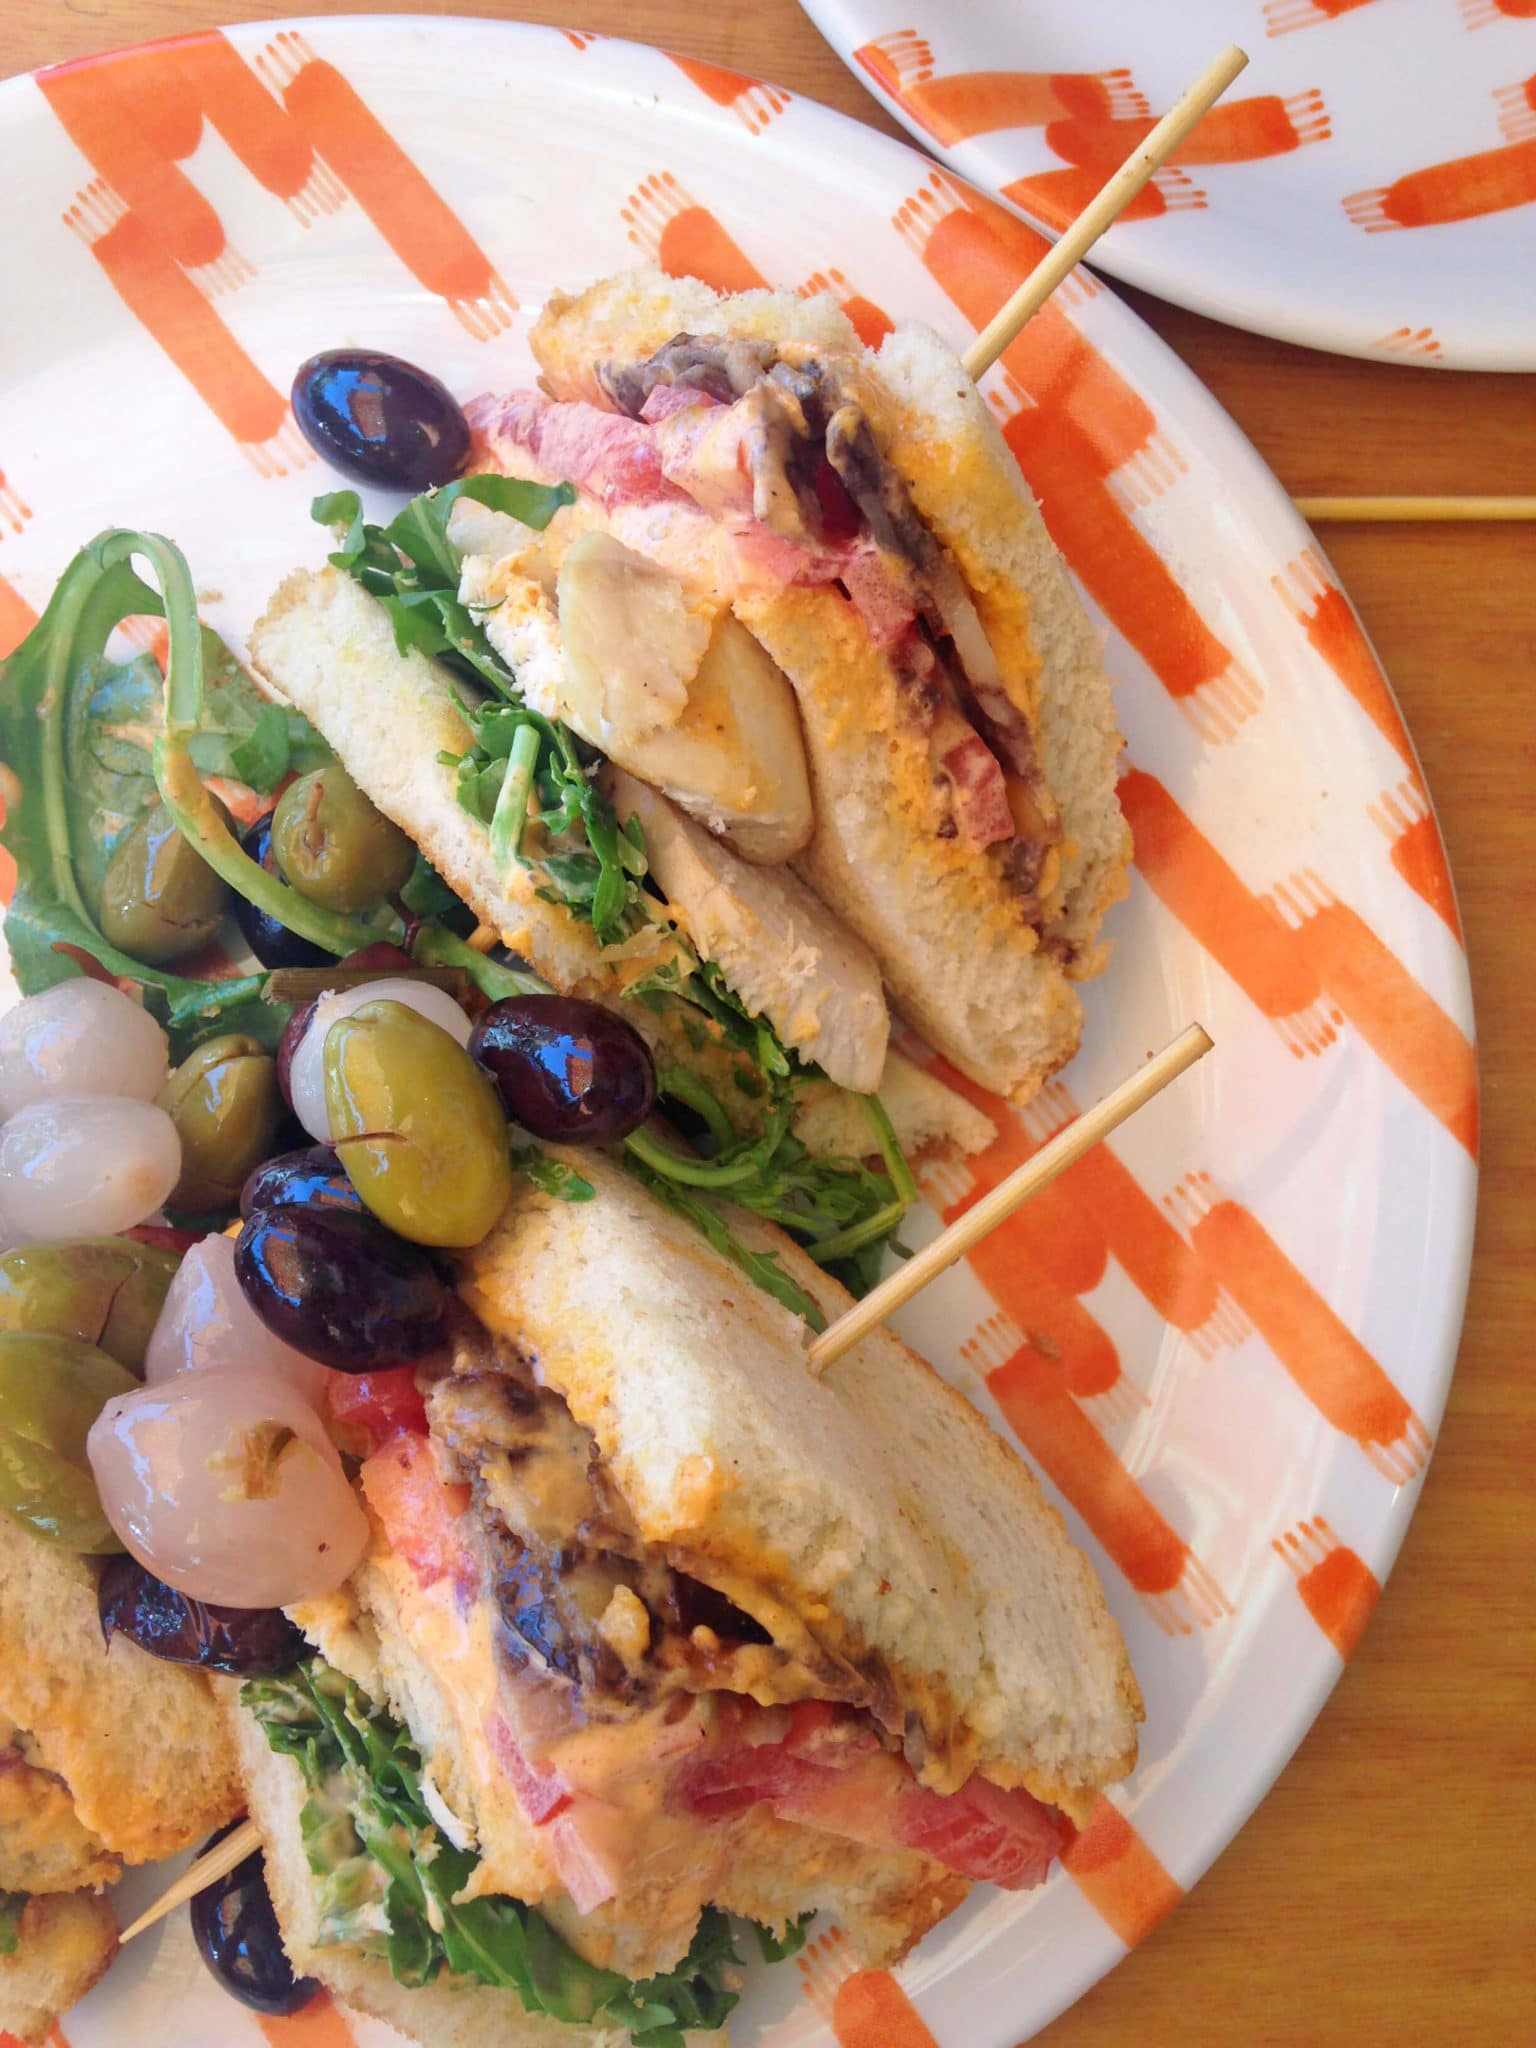 Sandwich at Rebost